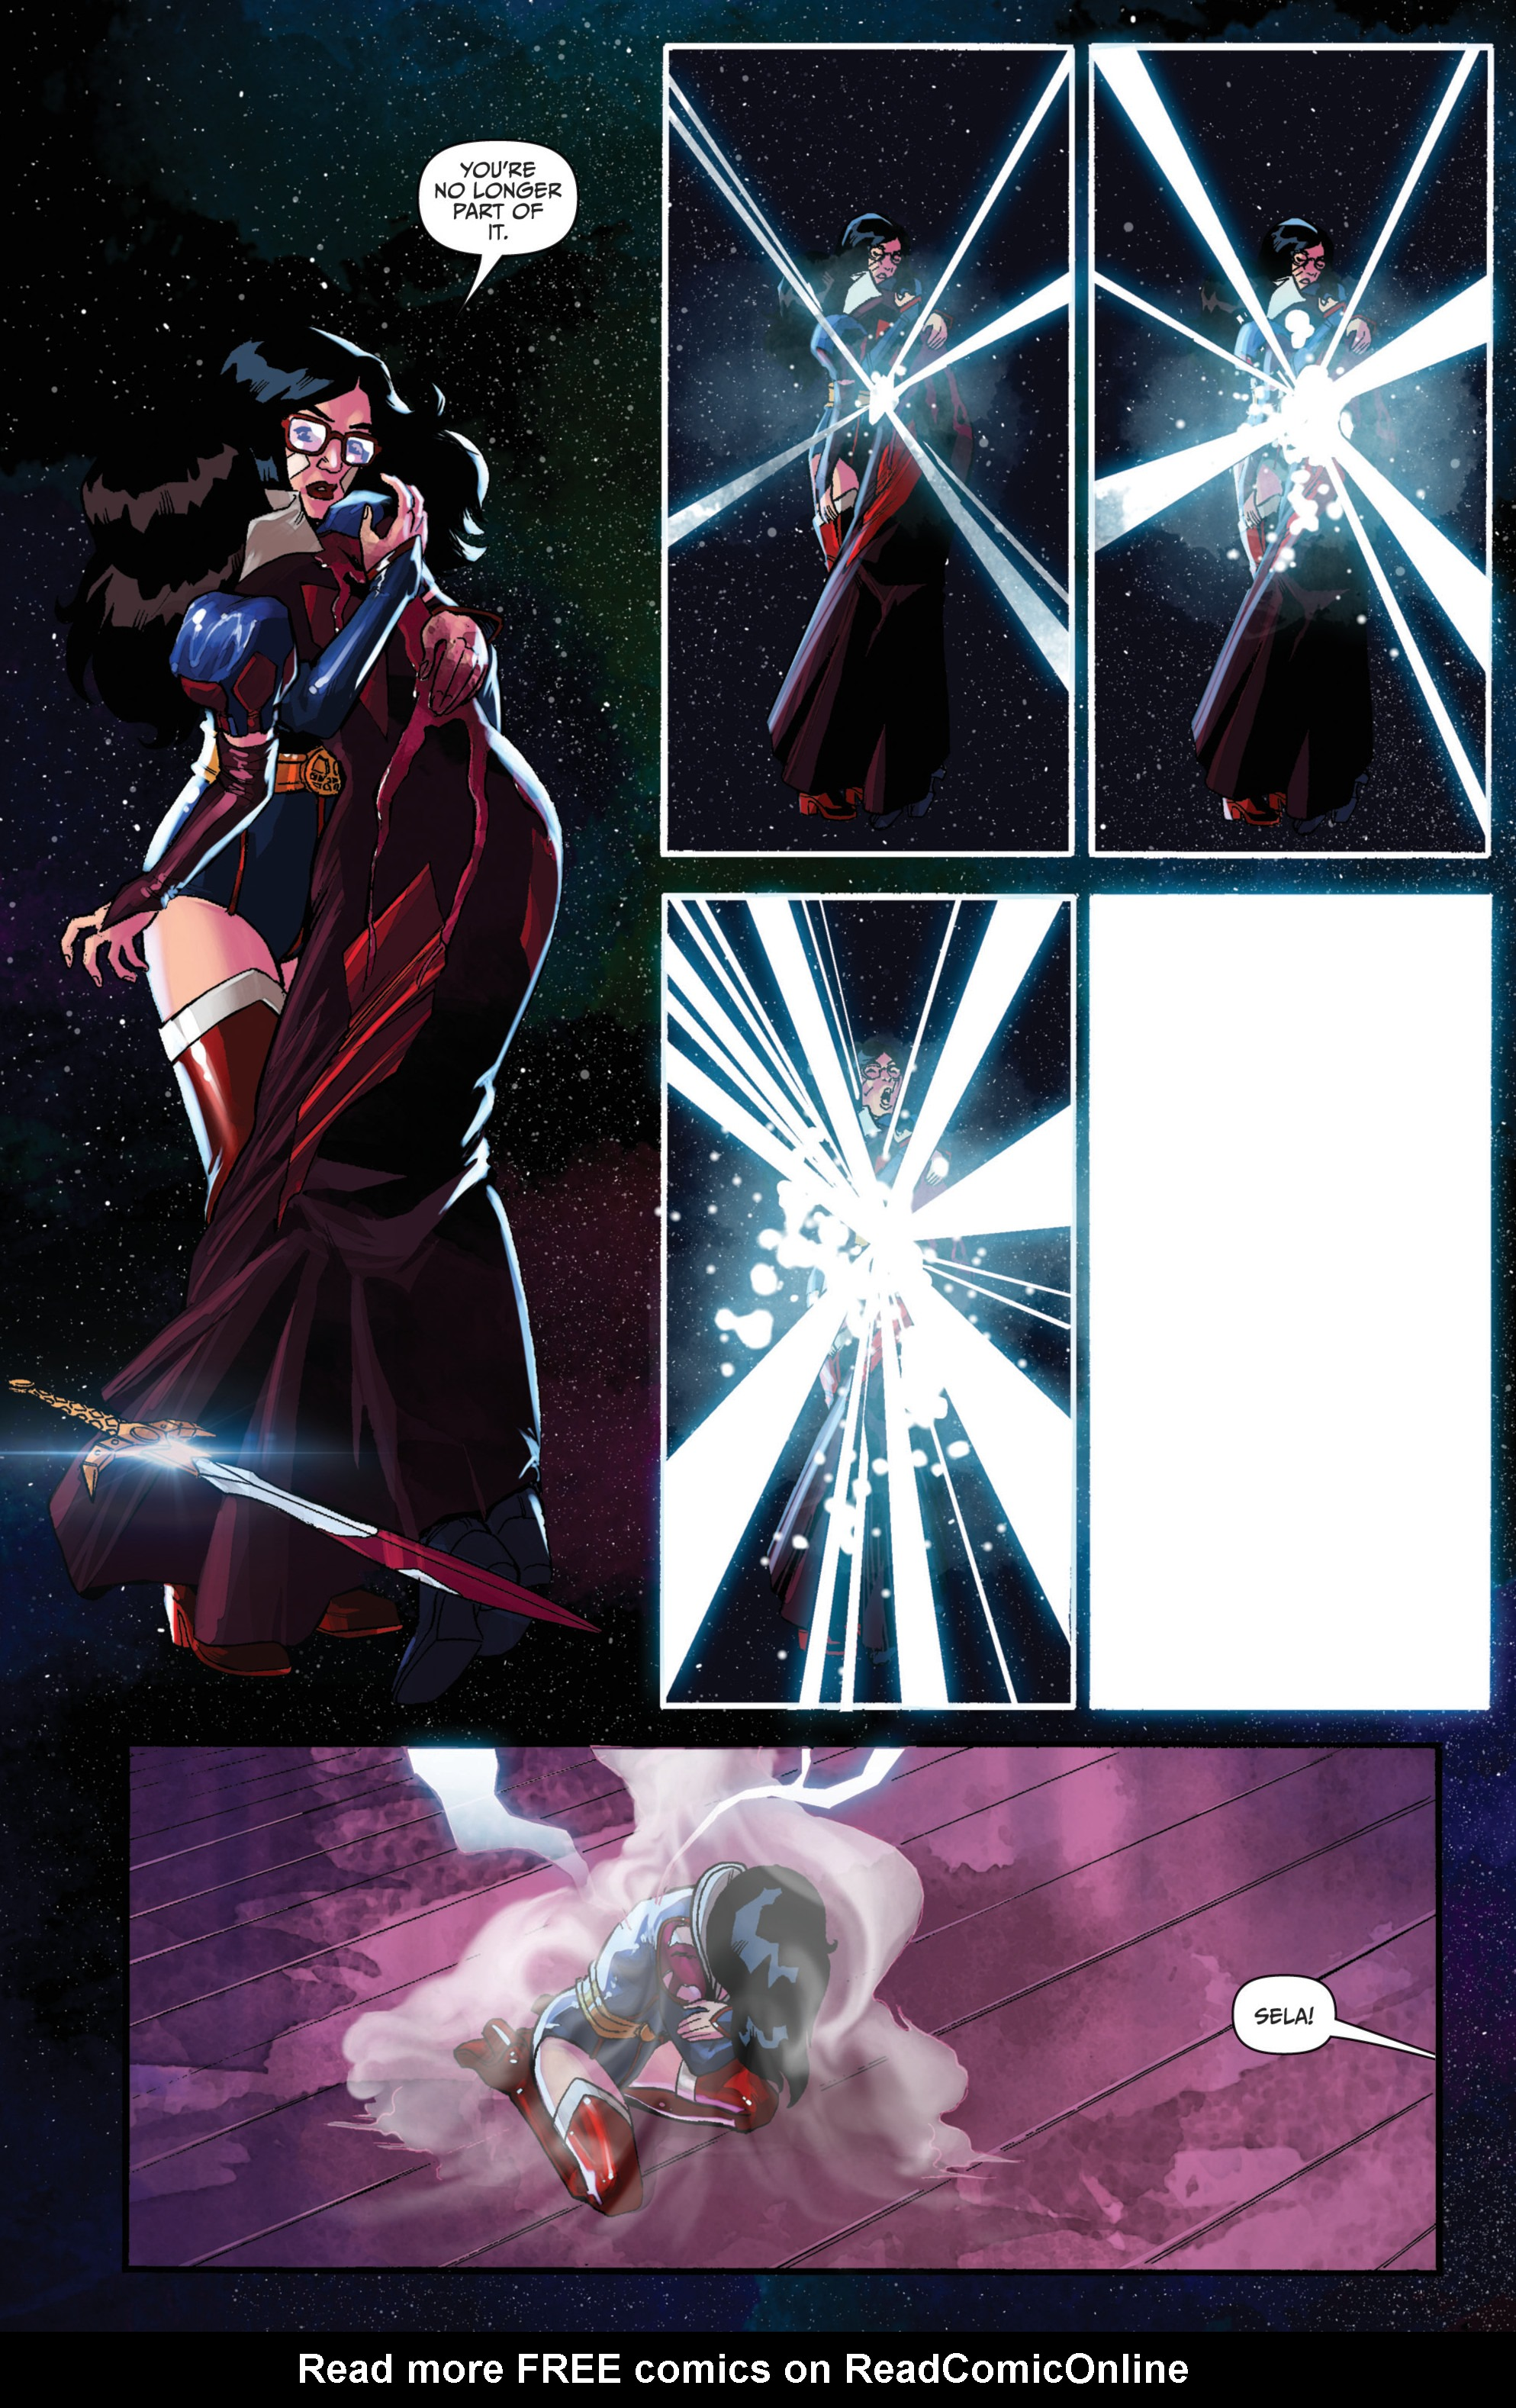 Read online Snow White vs. Snow White comic -  Issue #2 - 28